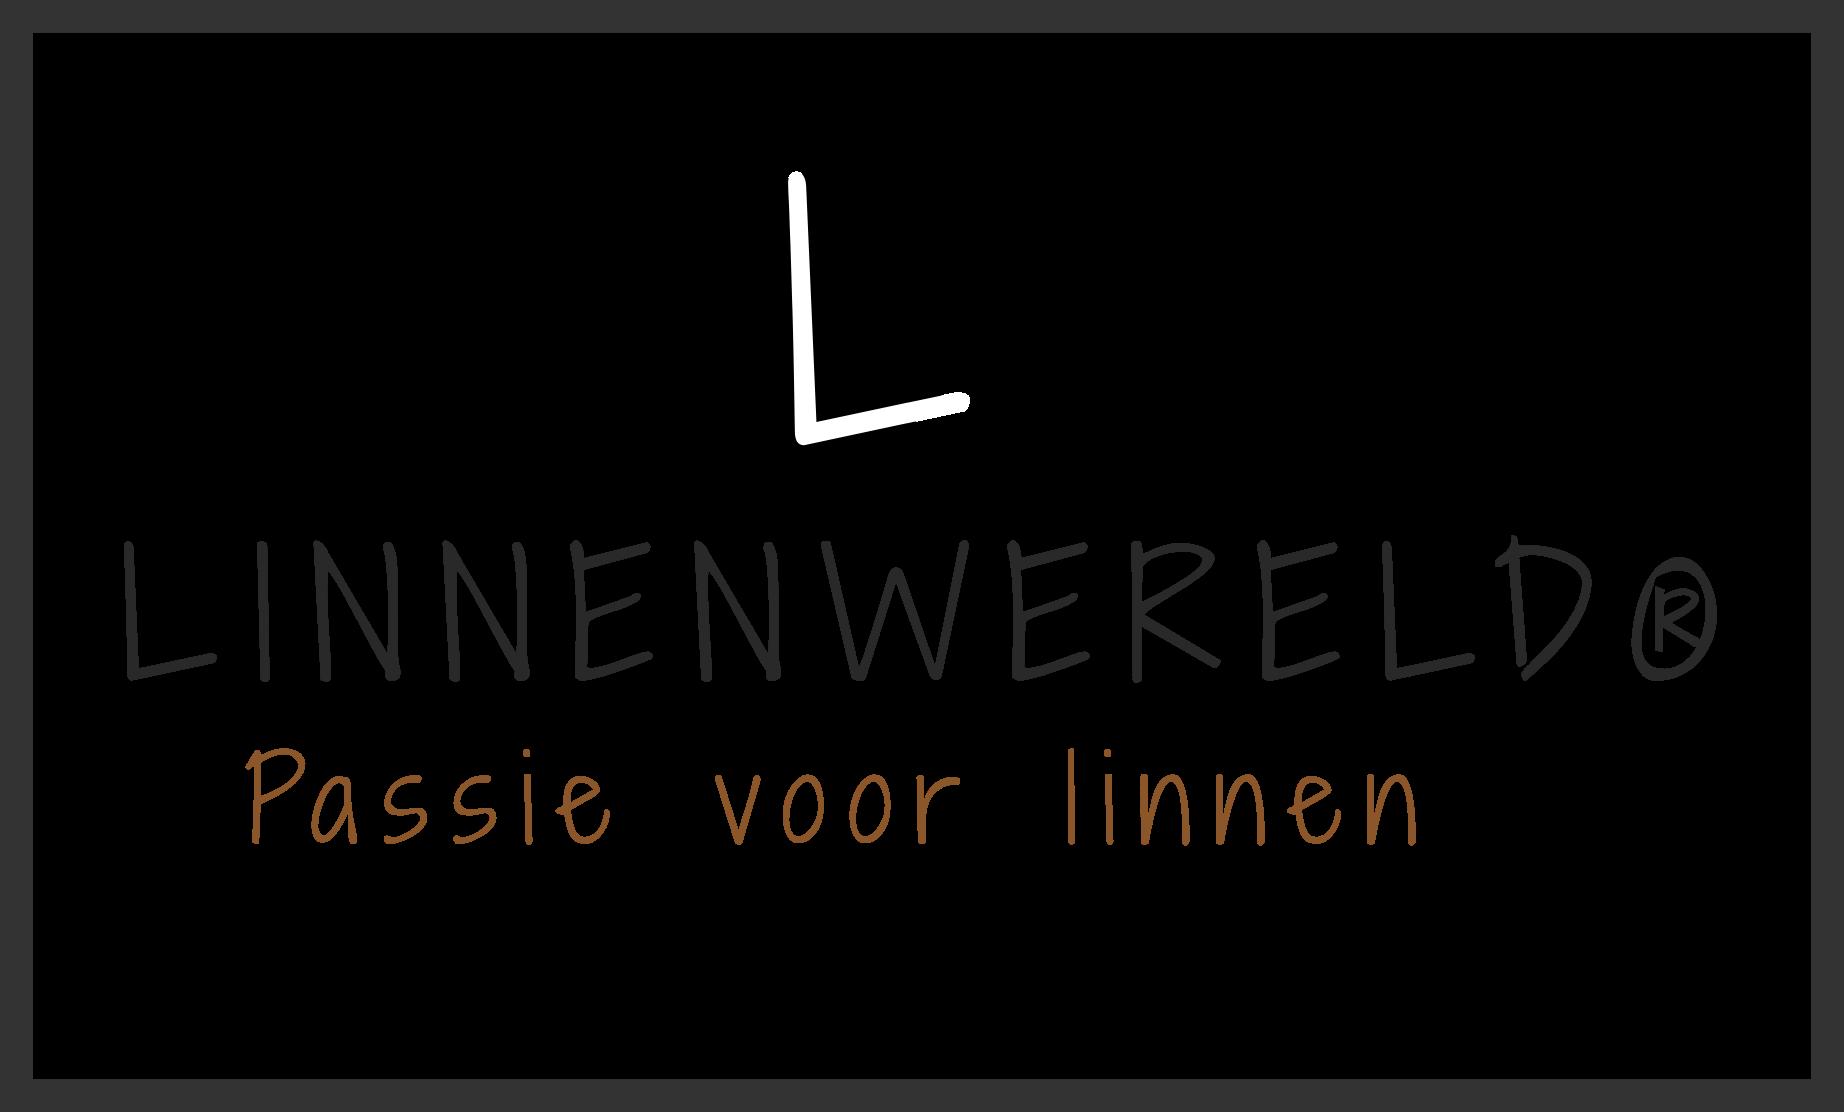 Linnenwereld.nl